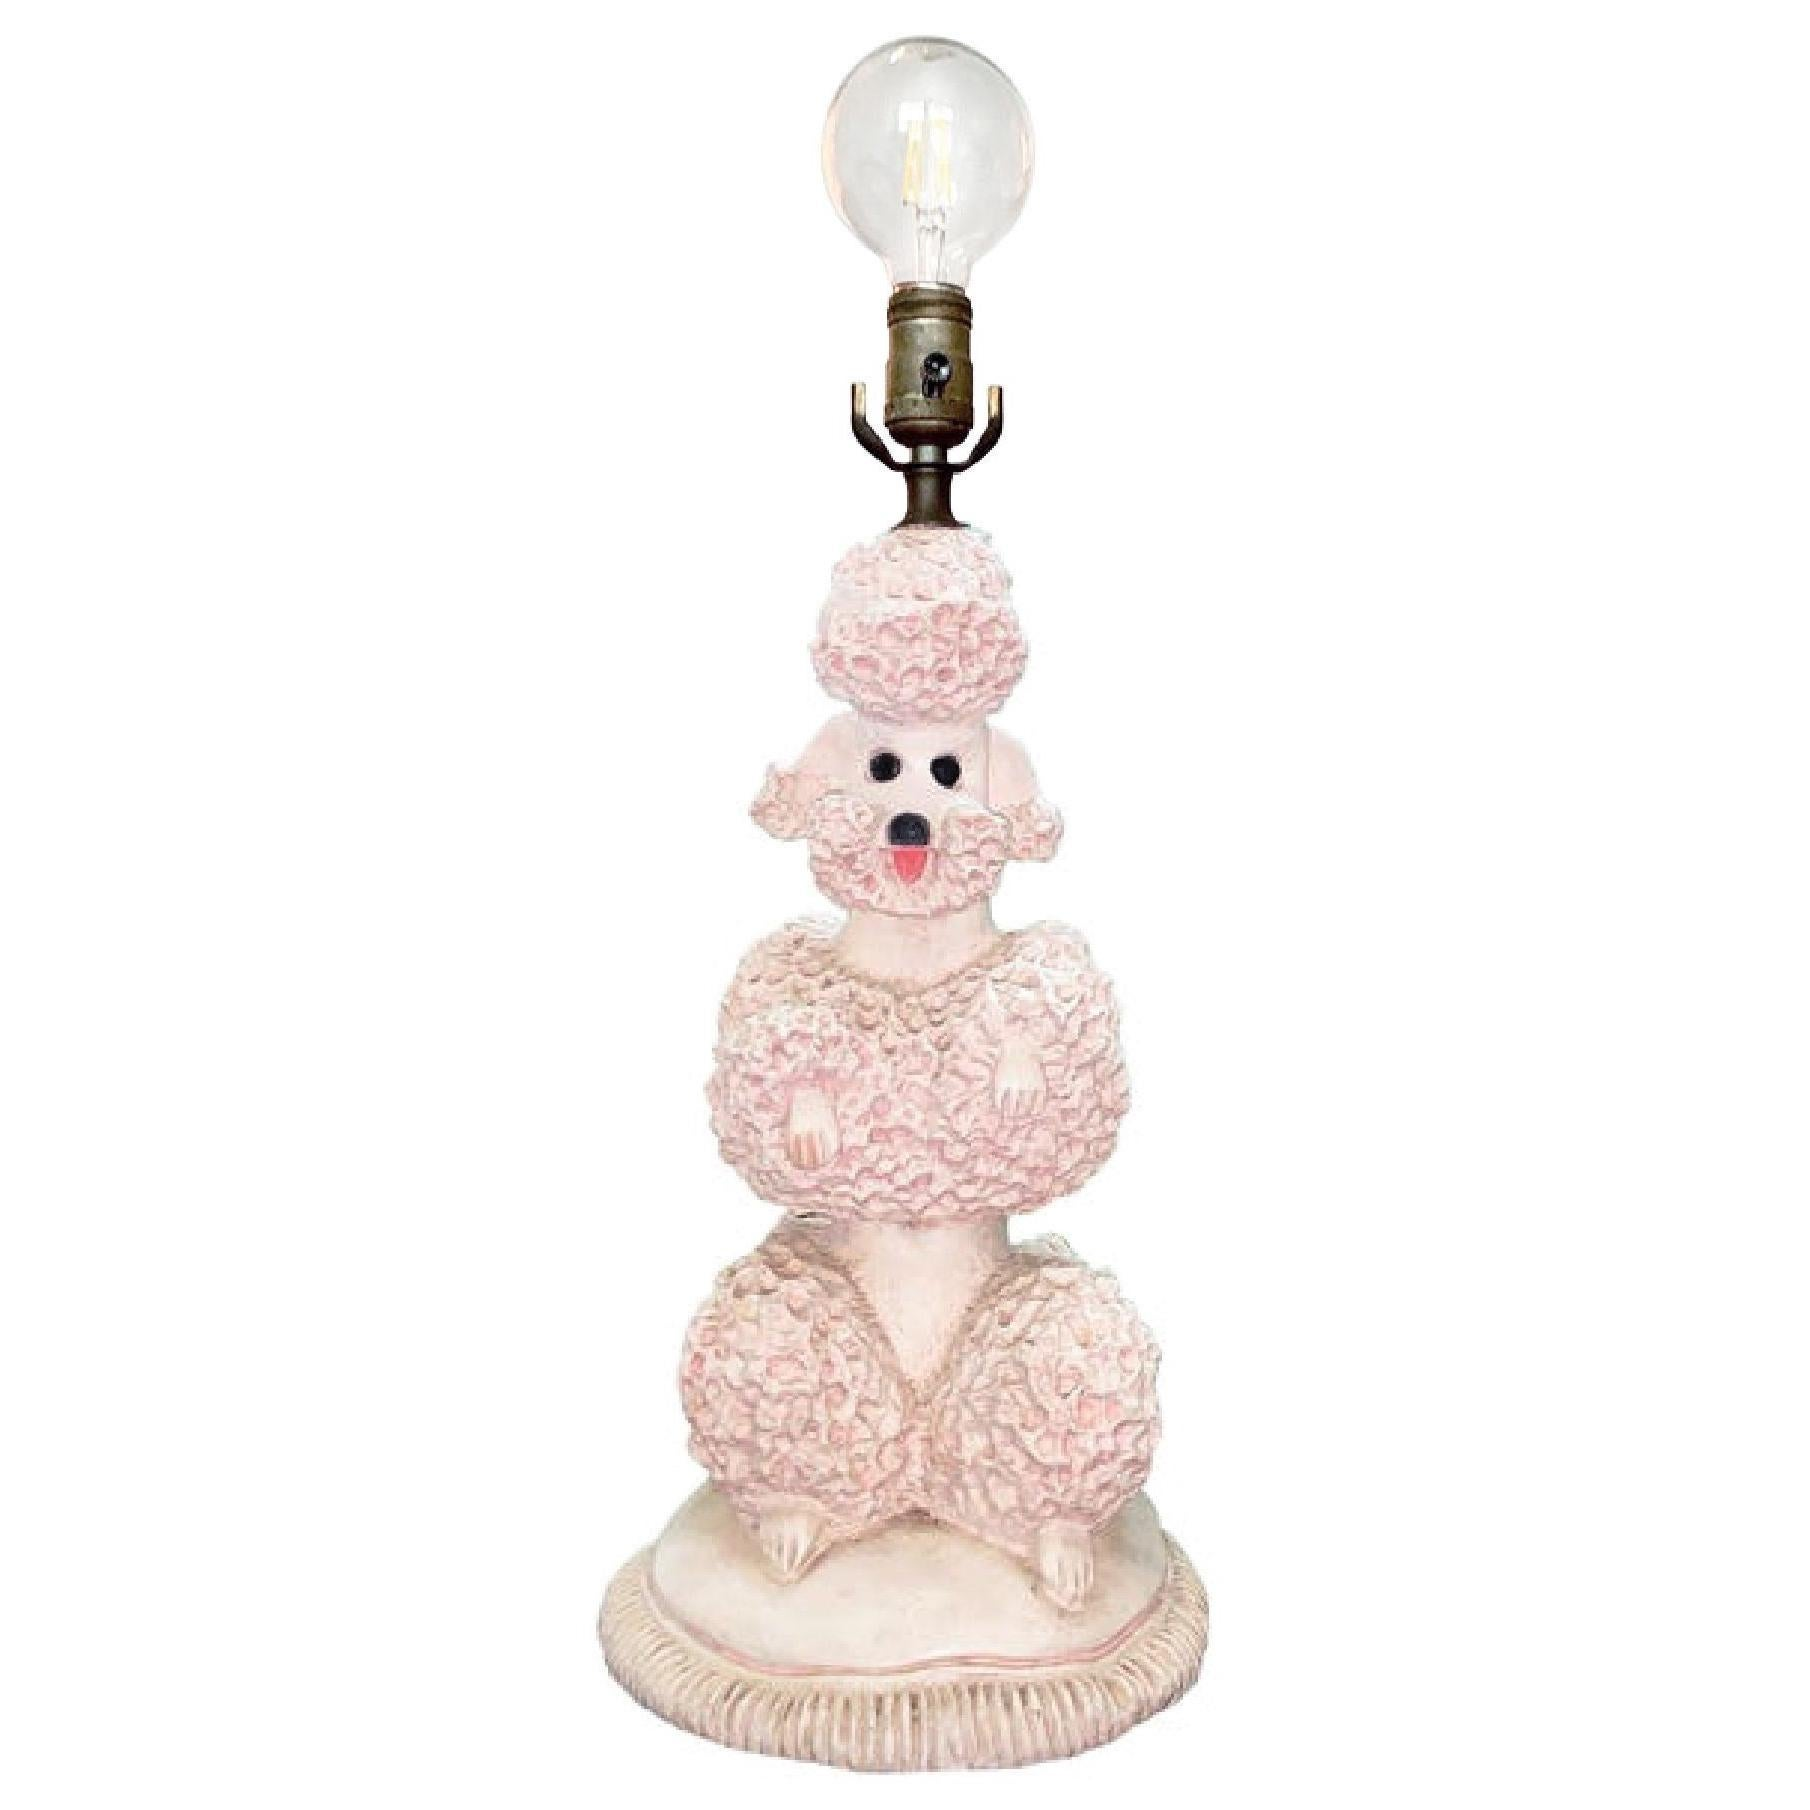 Phyllis Morris Original Poodle Table Lamp, Signed, Pink, 1952 Hollywood Regency